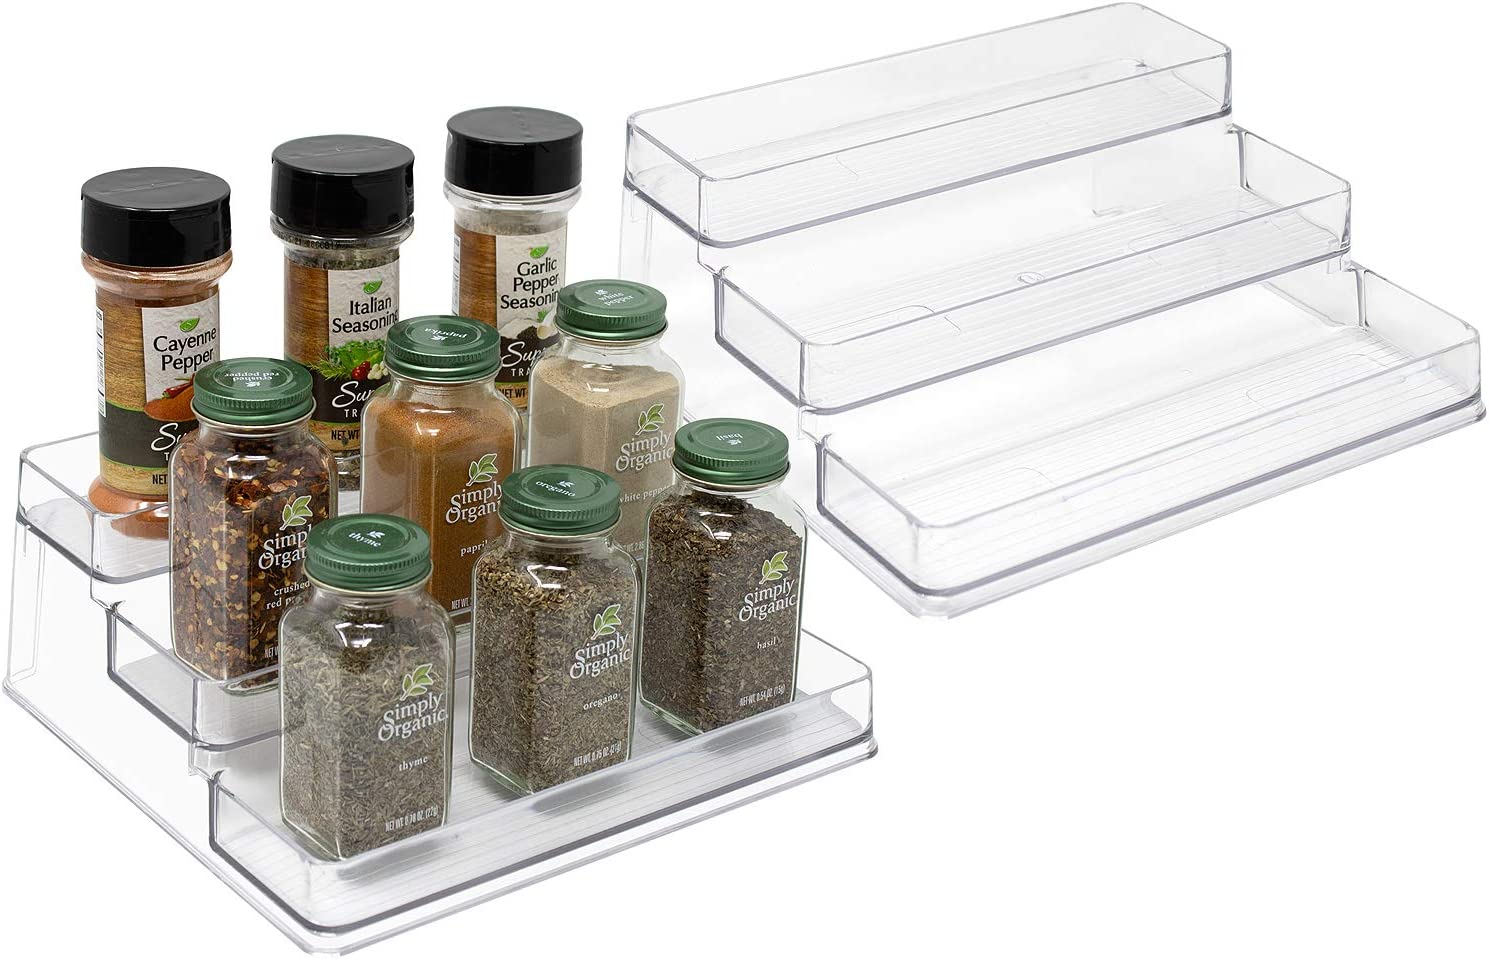 Sorbus 3-Tier Plastic Spice Rack Step Shelf Organizer for Kitchen Pantry, Cabinet, Countertops, Bathroom, Desk, Clear Plastic (2-Pack)